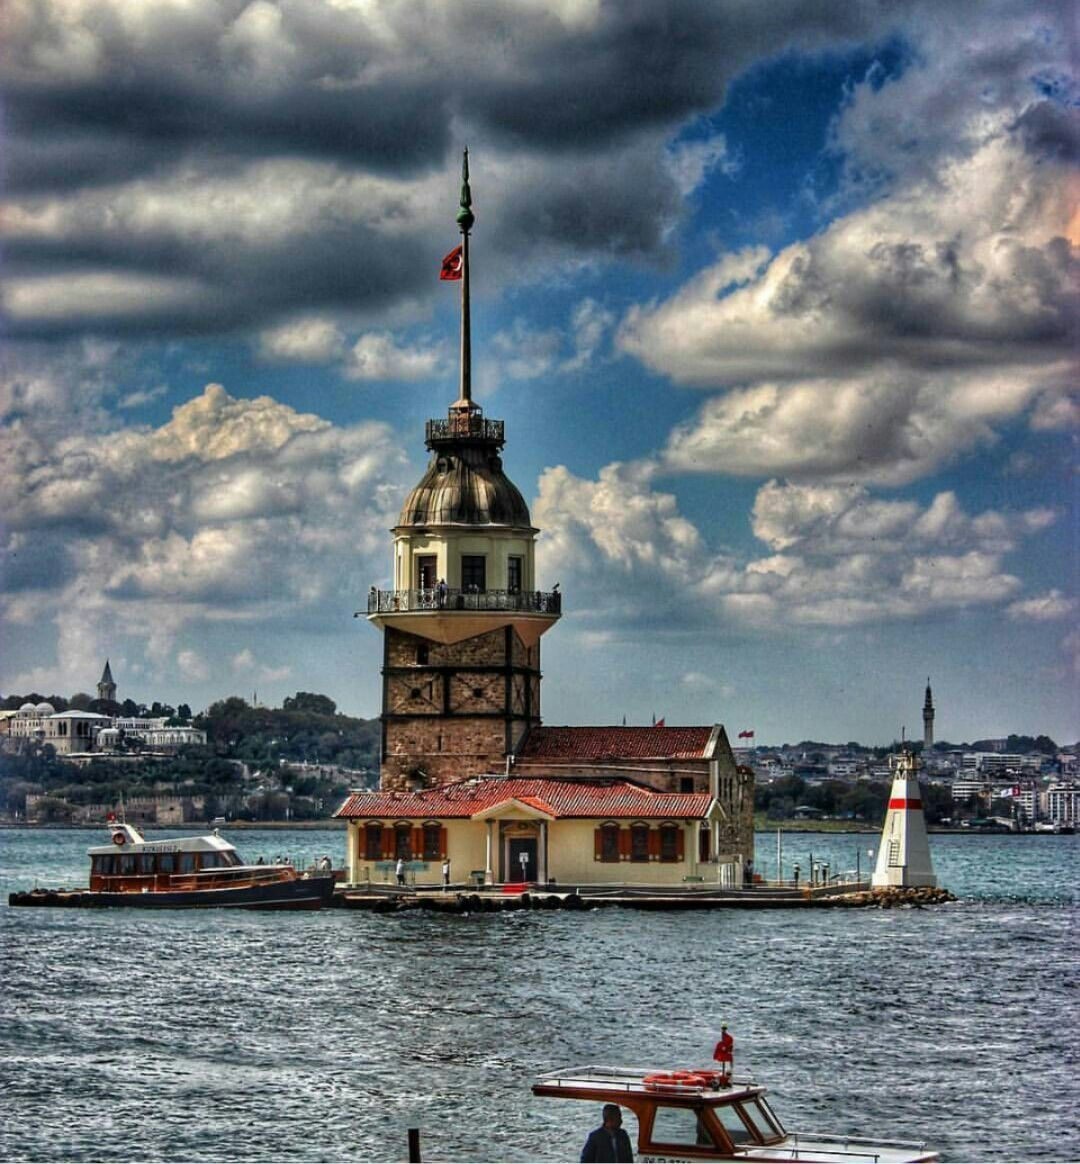 S07e09 Turkey Istanbul Kiz Kulesi Turk Mimarisi Mimari Fotografcilik Istanbul